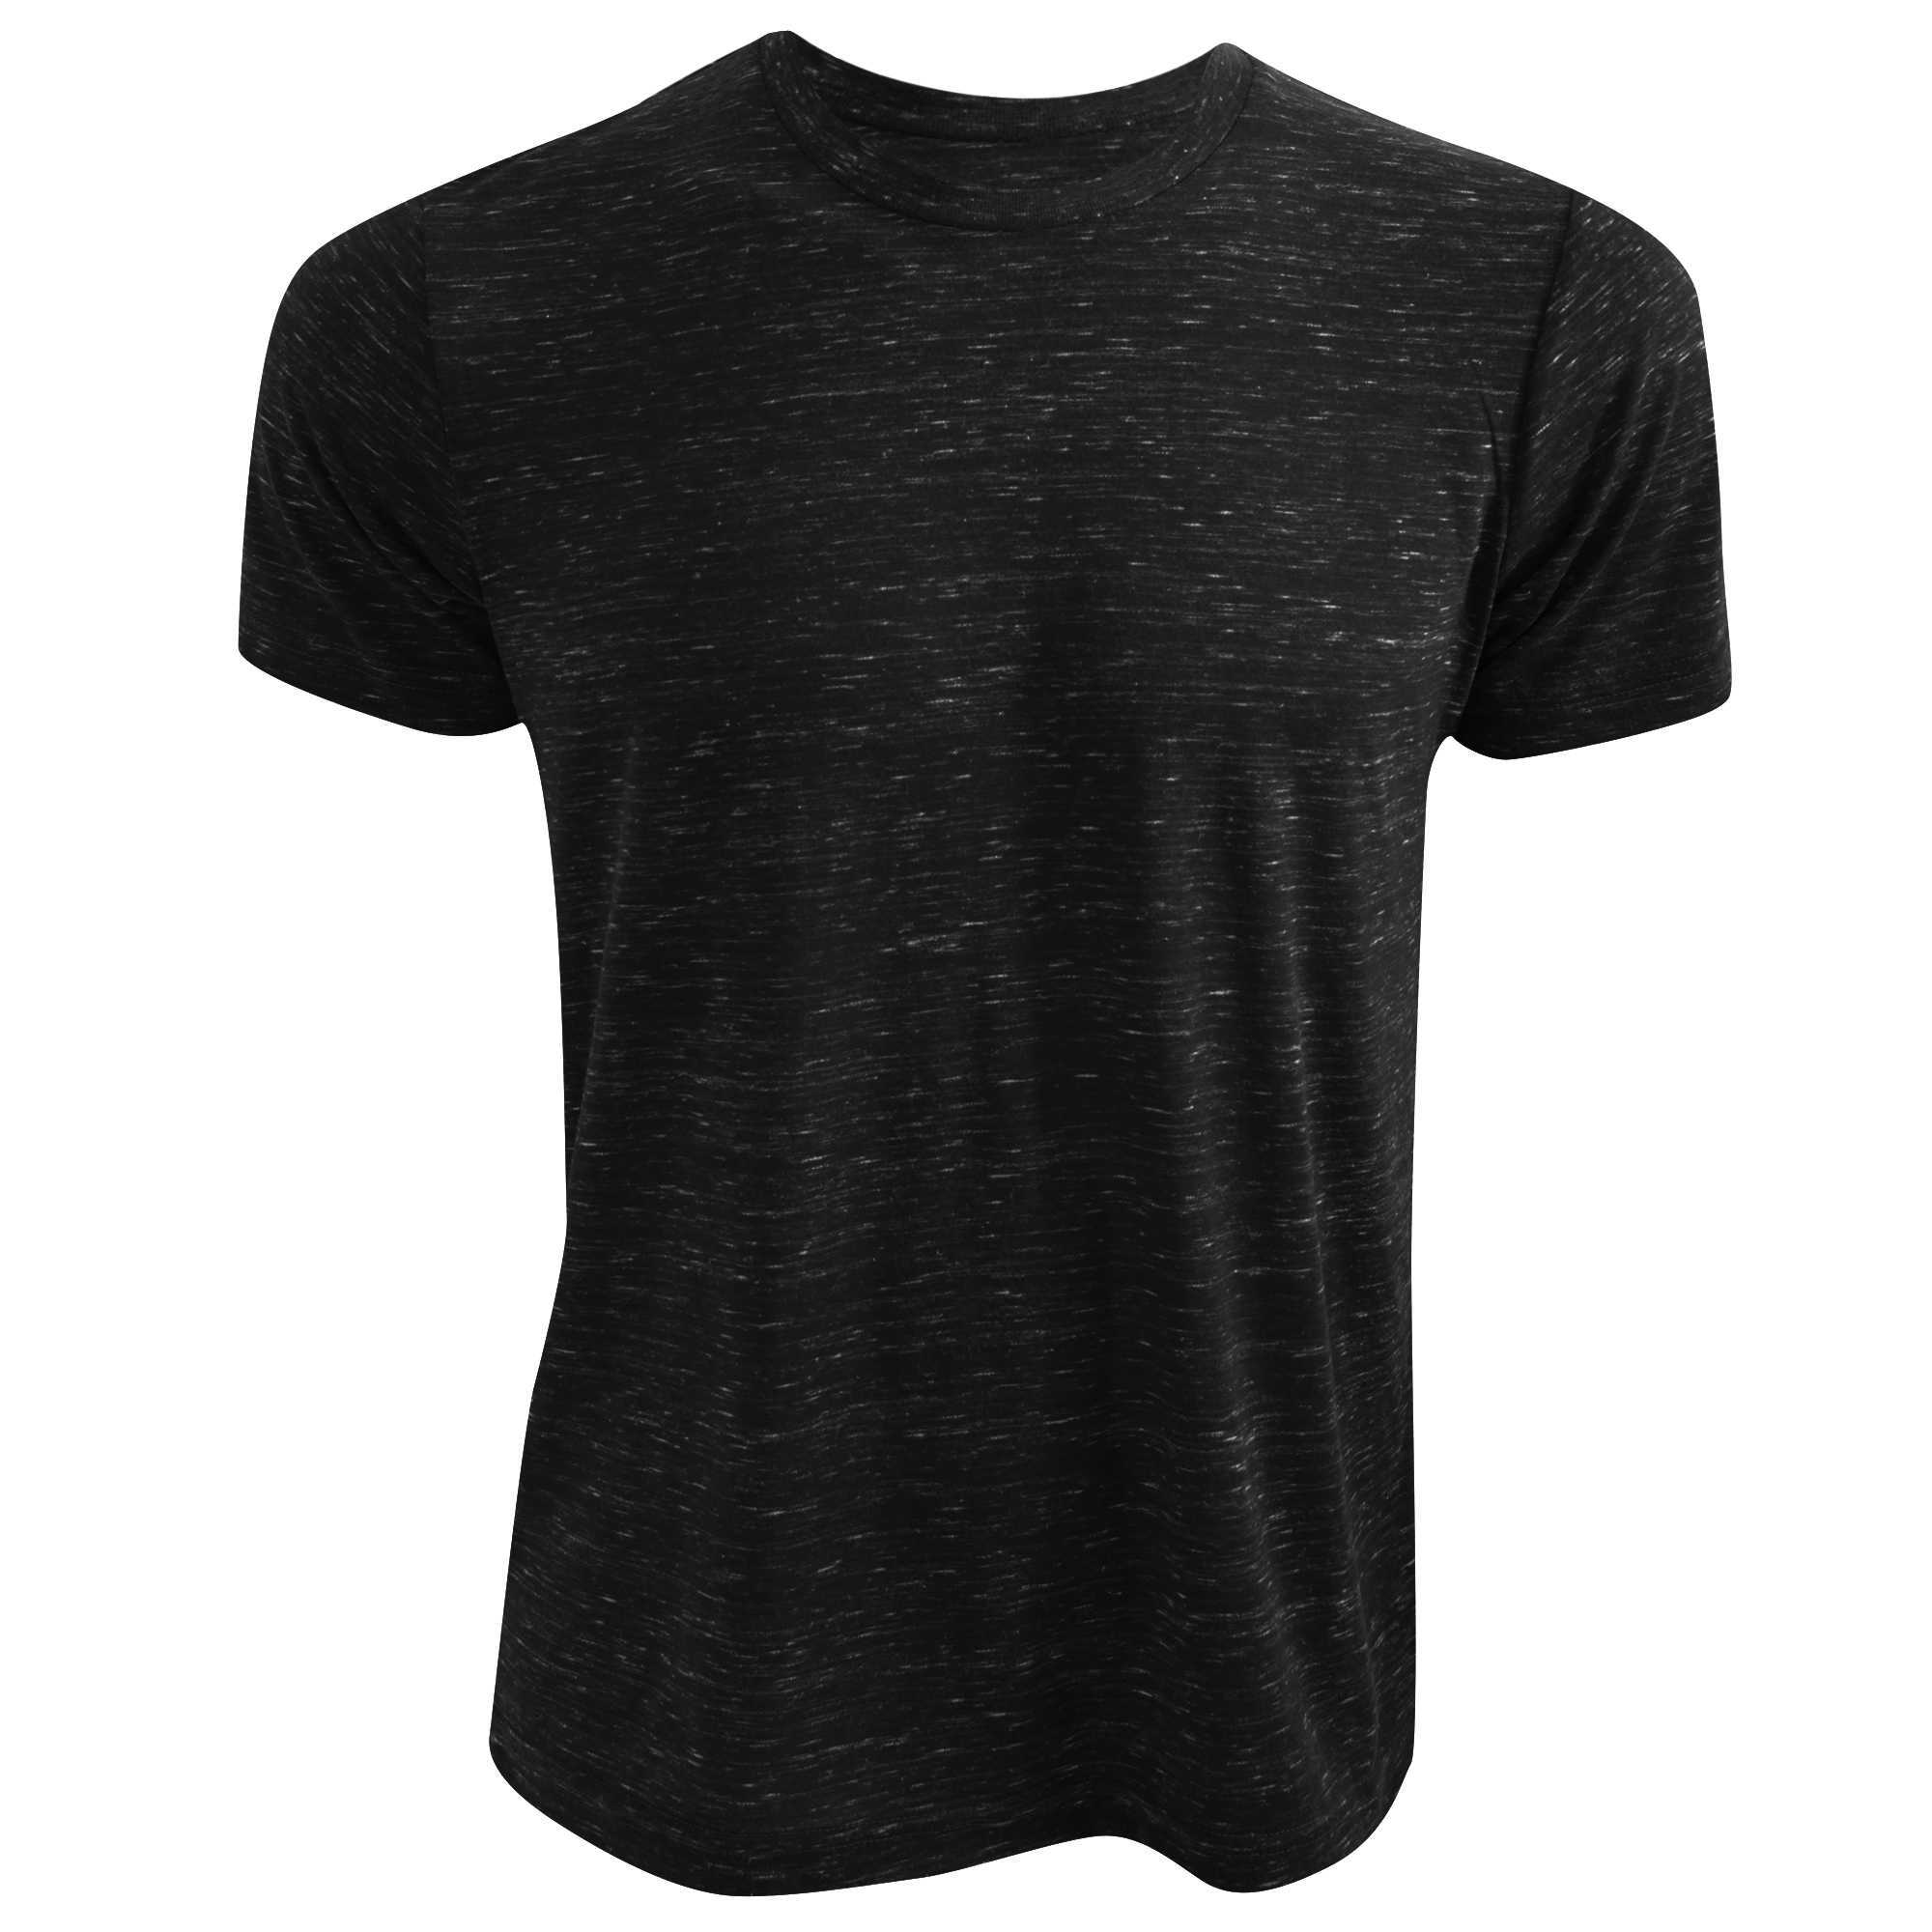 Canvas-Camiseta-de-manga-corta-Unisex-Hombre-Mujer-Mezcla-algodon-polieste